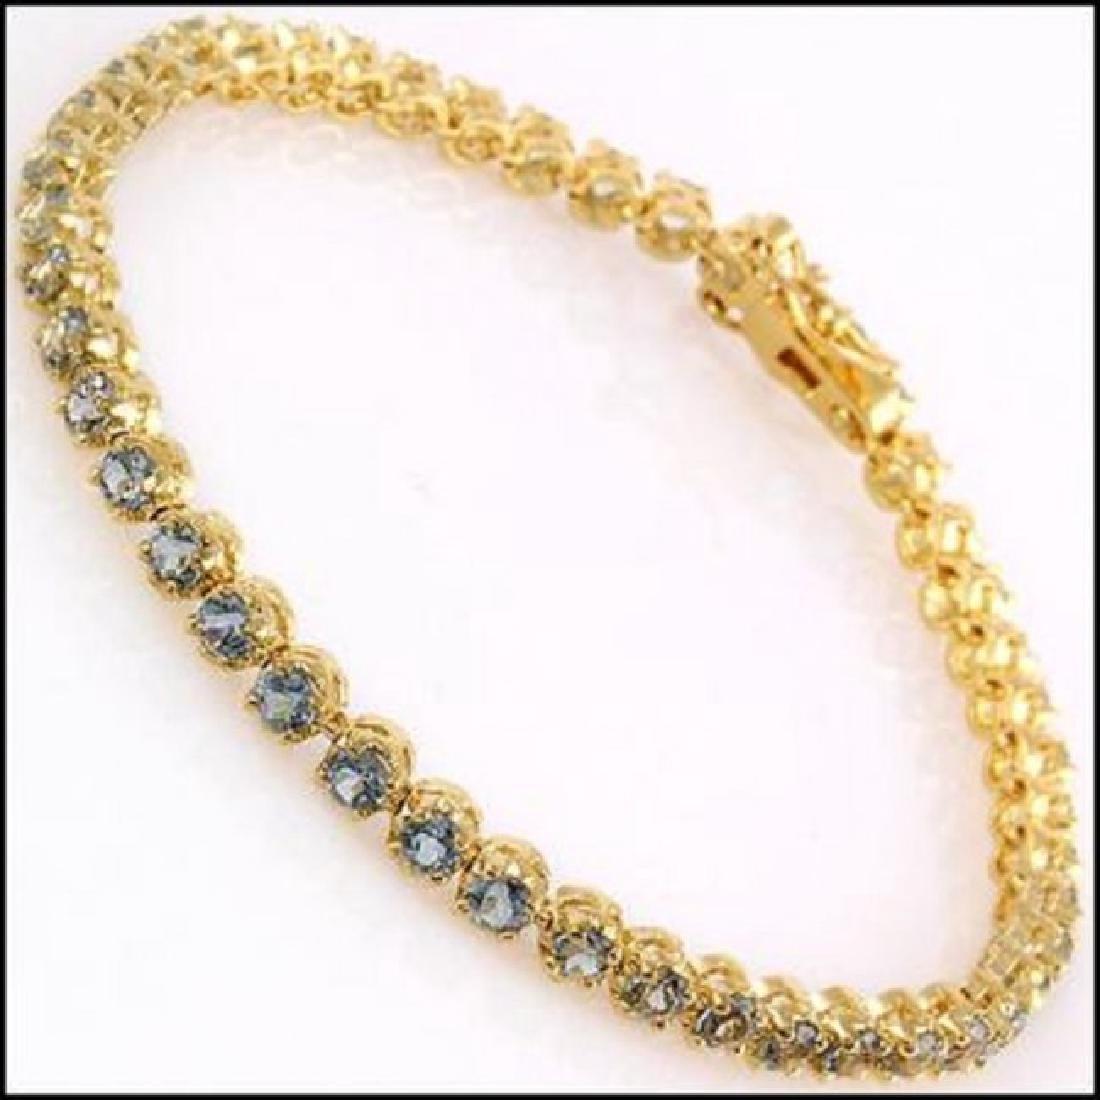 10.22 CT Blue Topaz Tennis Fine Bracelet $1120